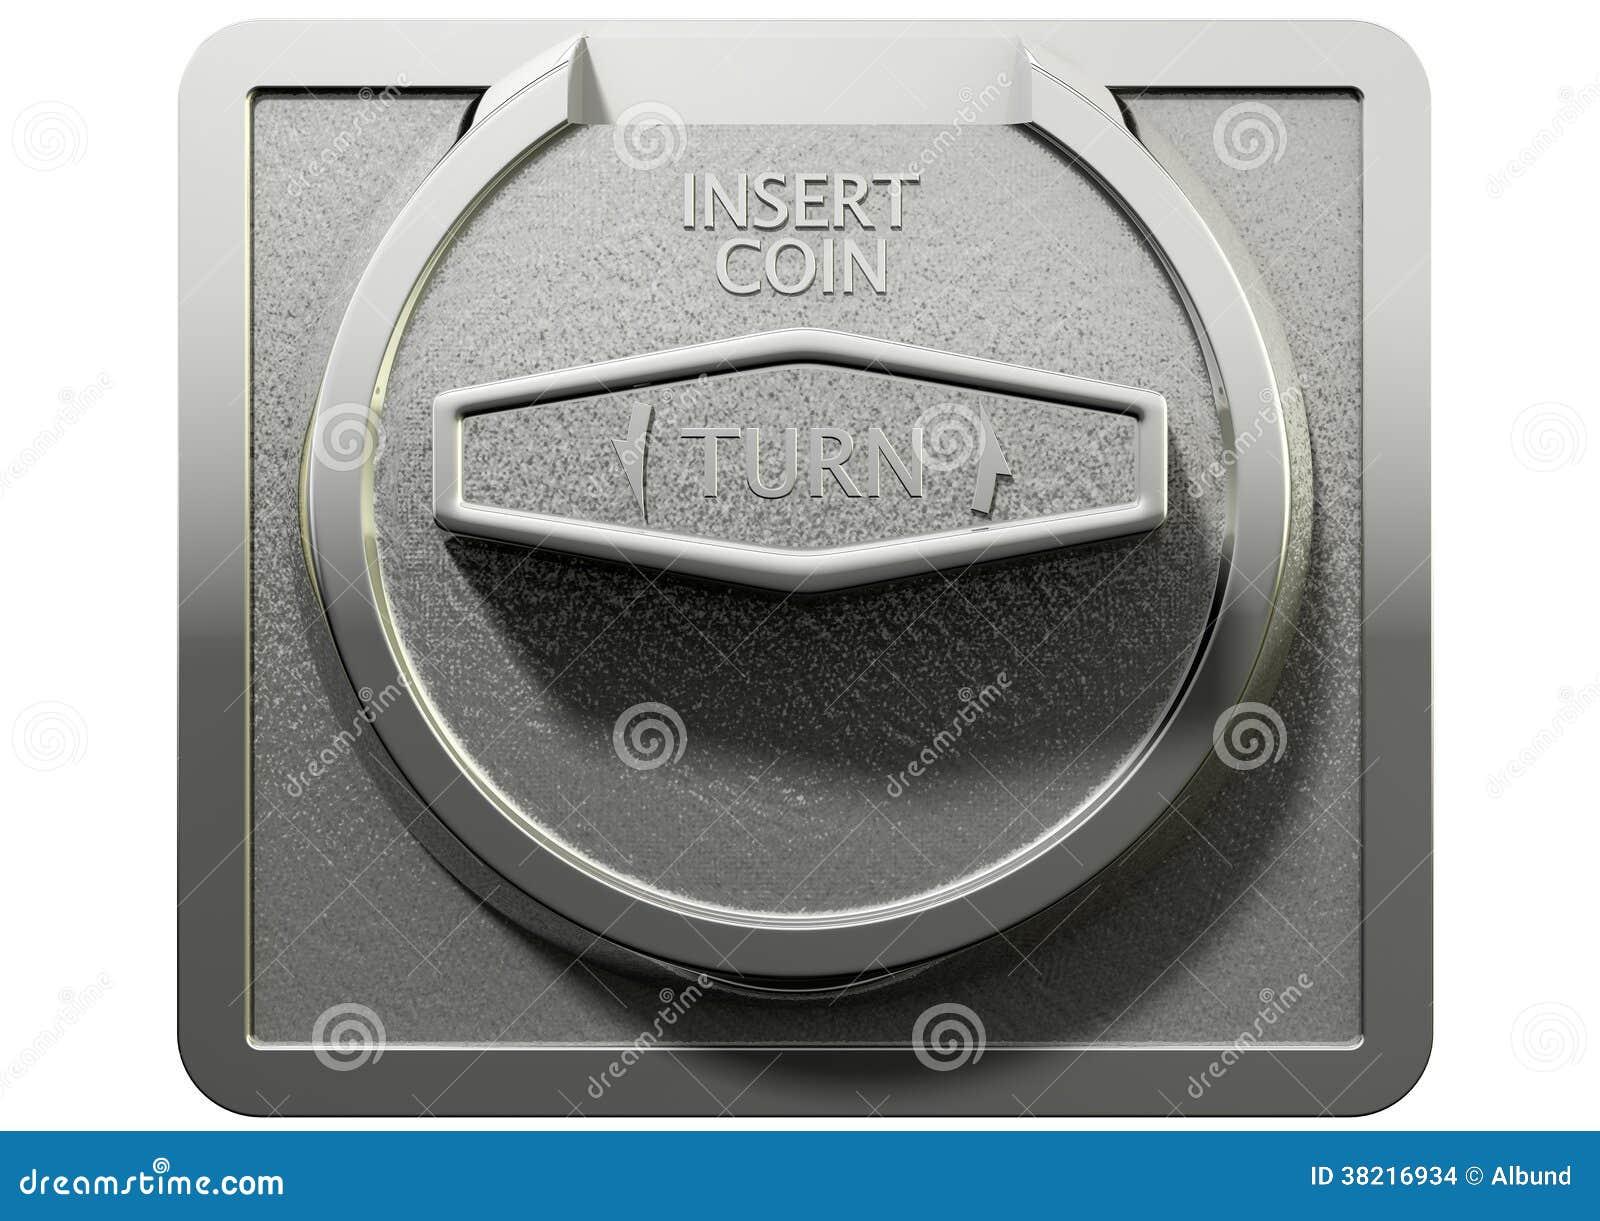 Gumball Machine Coin Mechanism Stock Photo Image Of